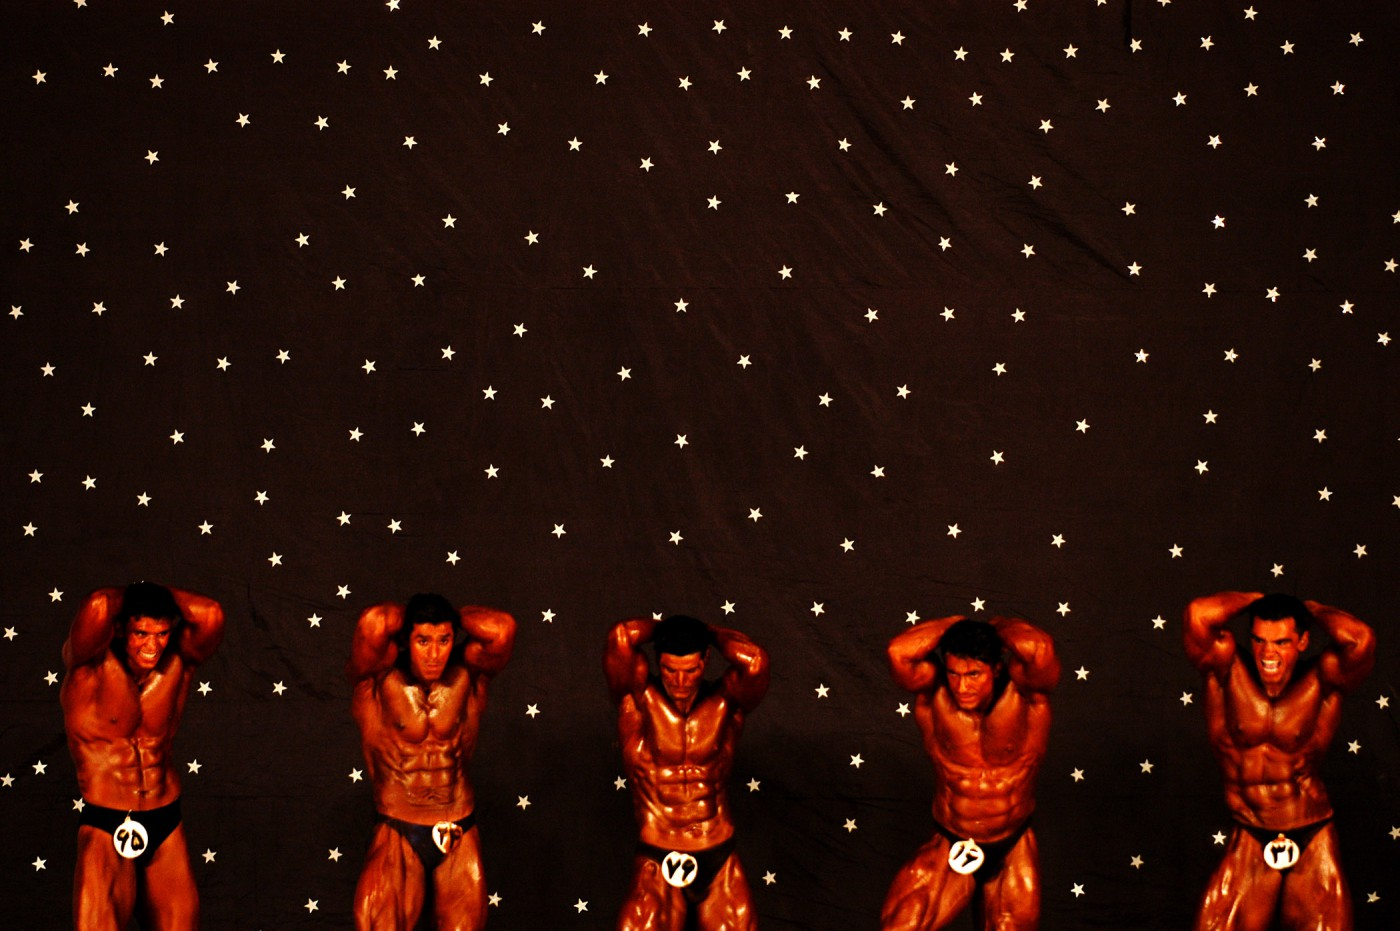 Abbas Kowsari, </span><span><em>Masculinity A series, No. 1</em>, </span><span>2006